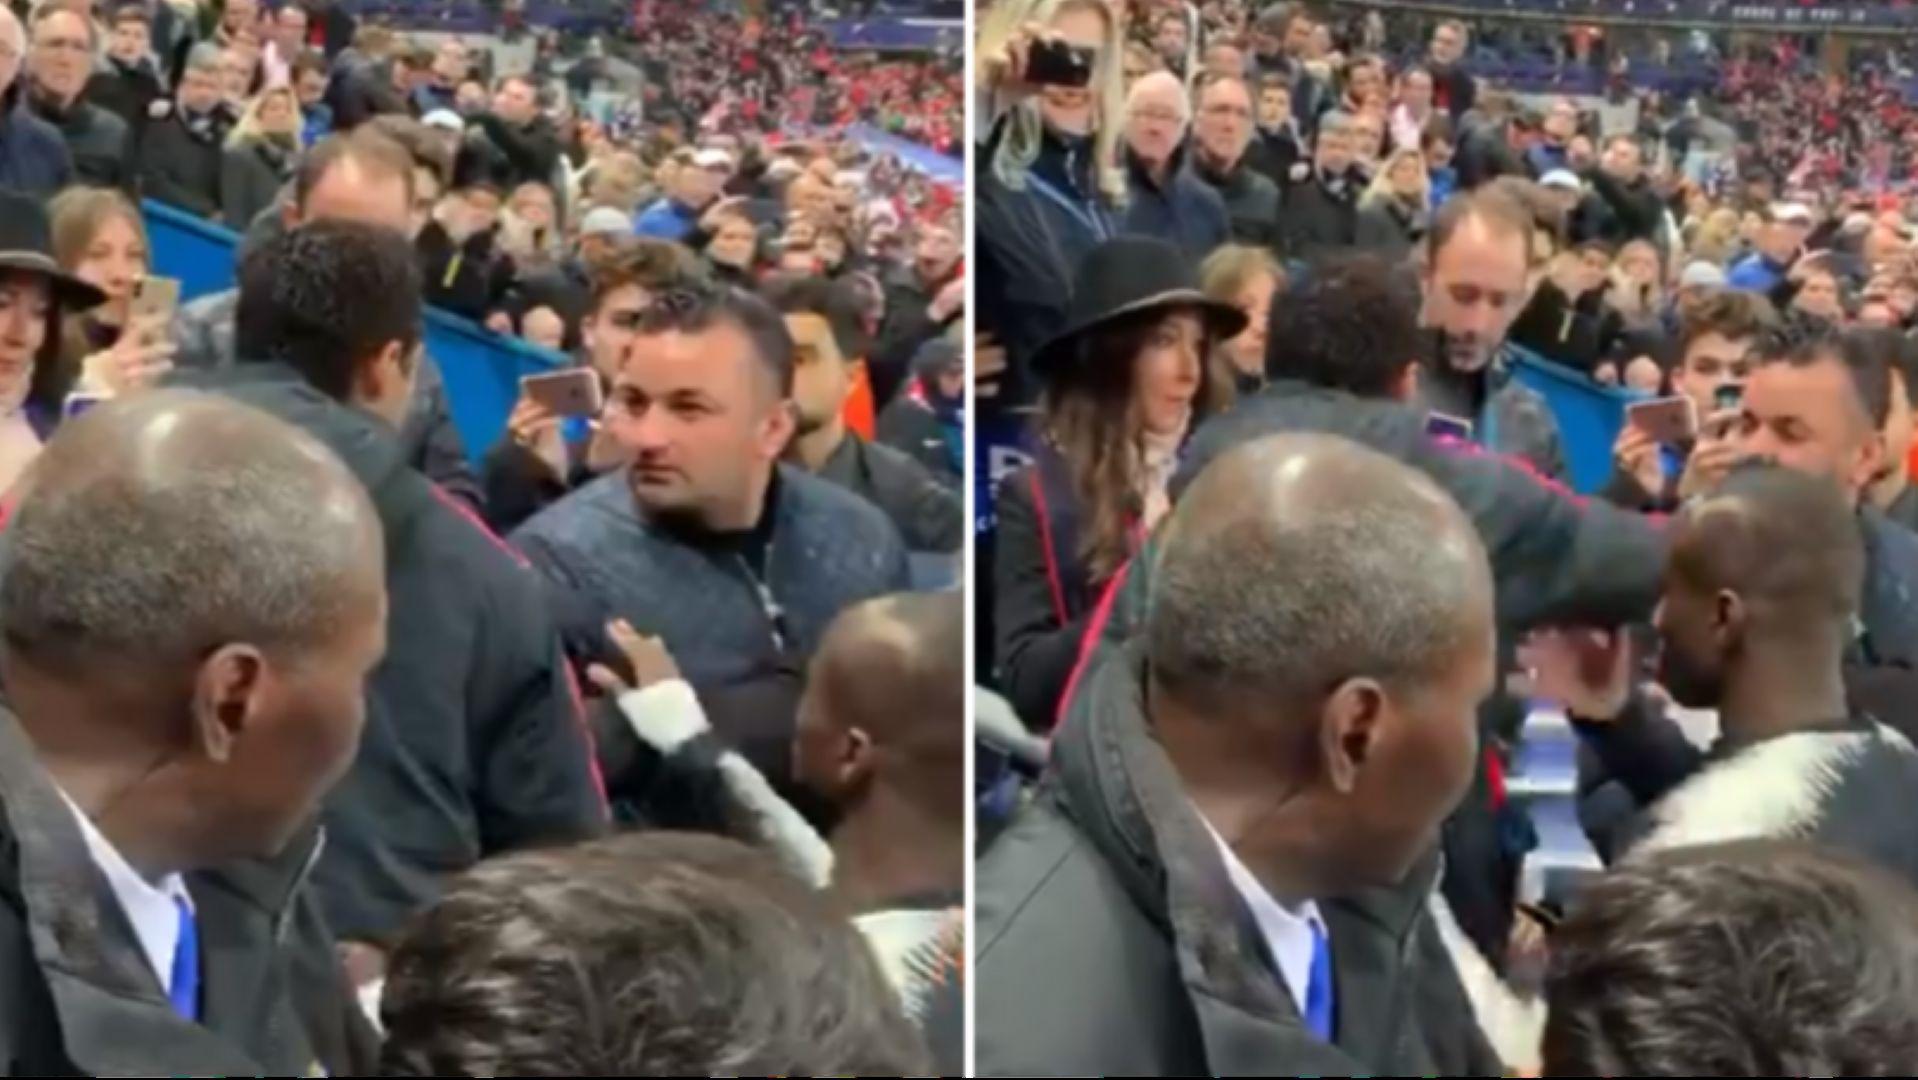 Атаката му срещу фен на Рен след финала за Купата на Франция предизвика и клуба, и треньора Томас Тухел да го критикуват